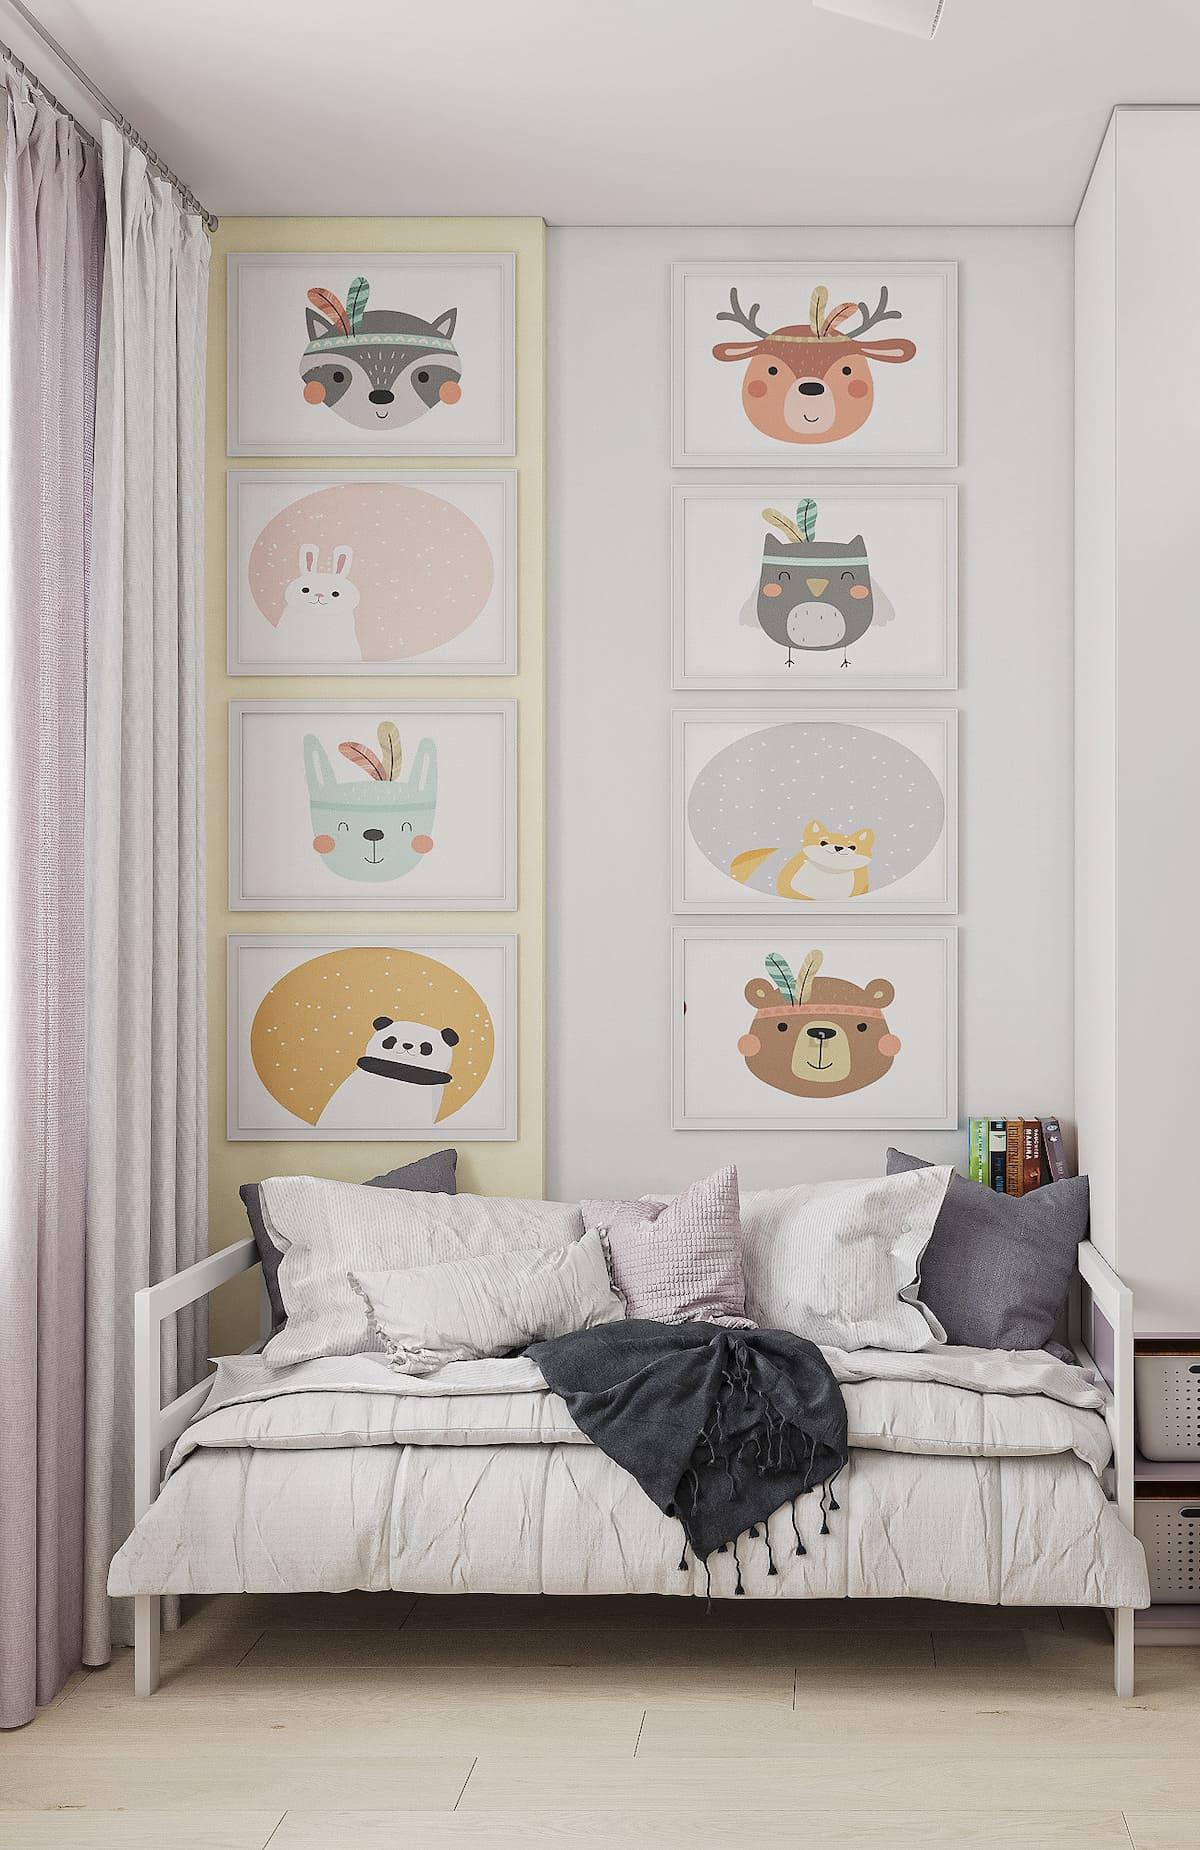 интерьер детской комнаты фото 31